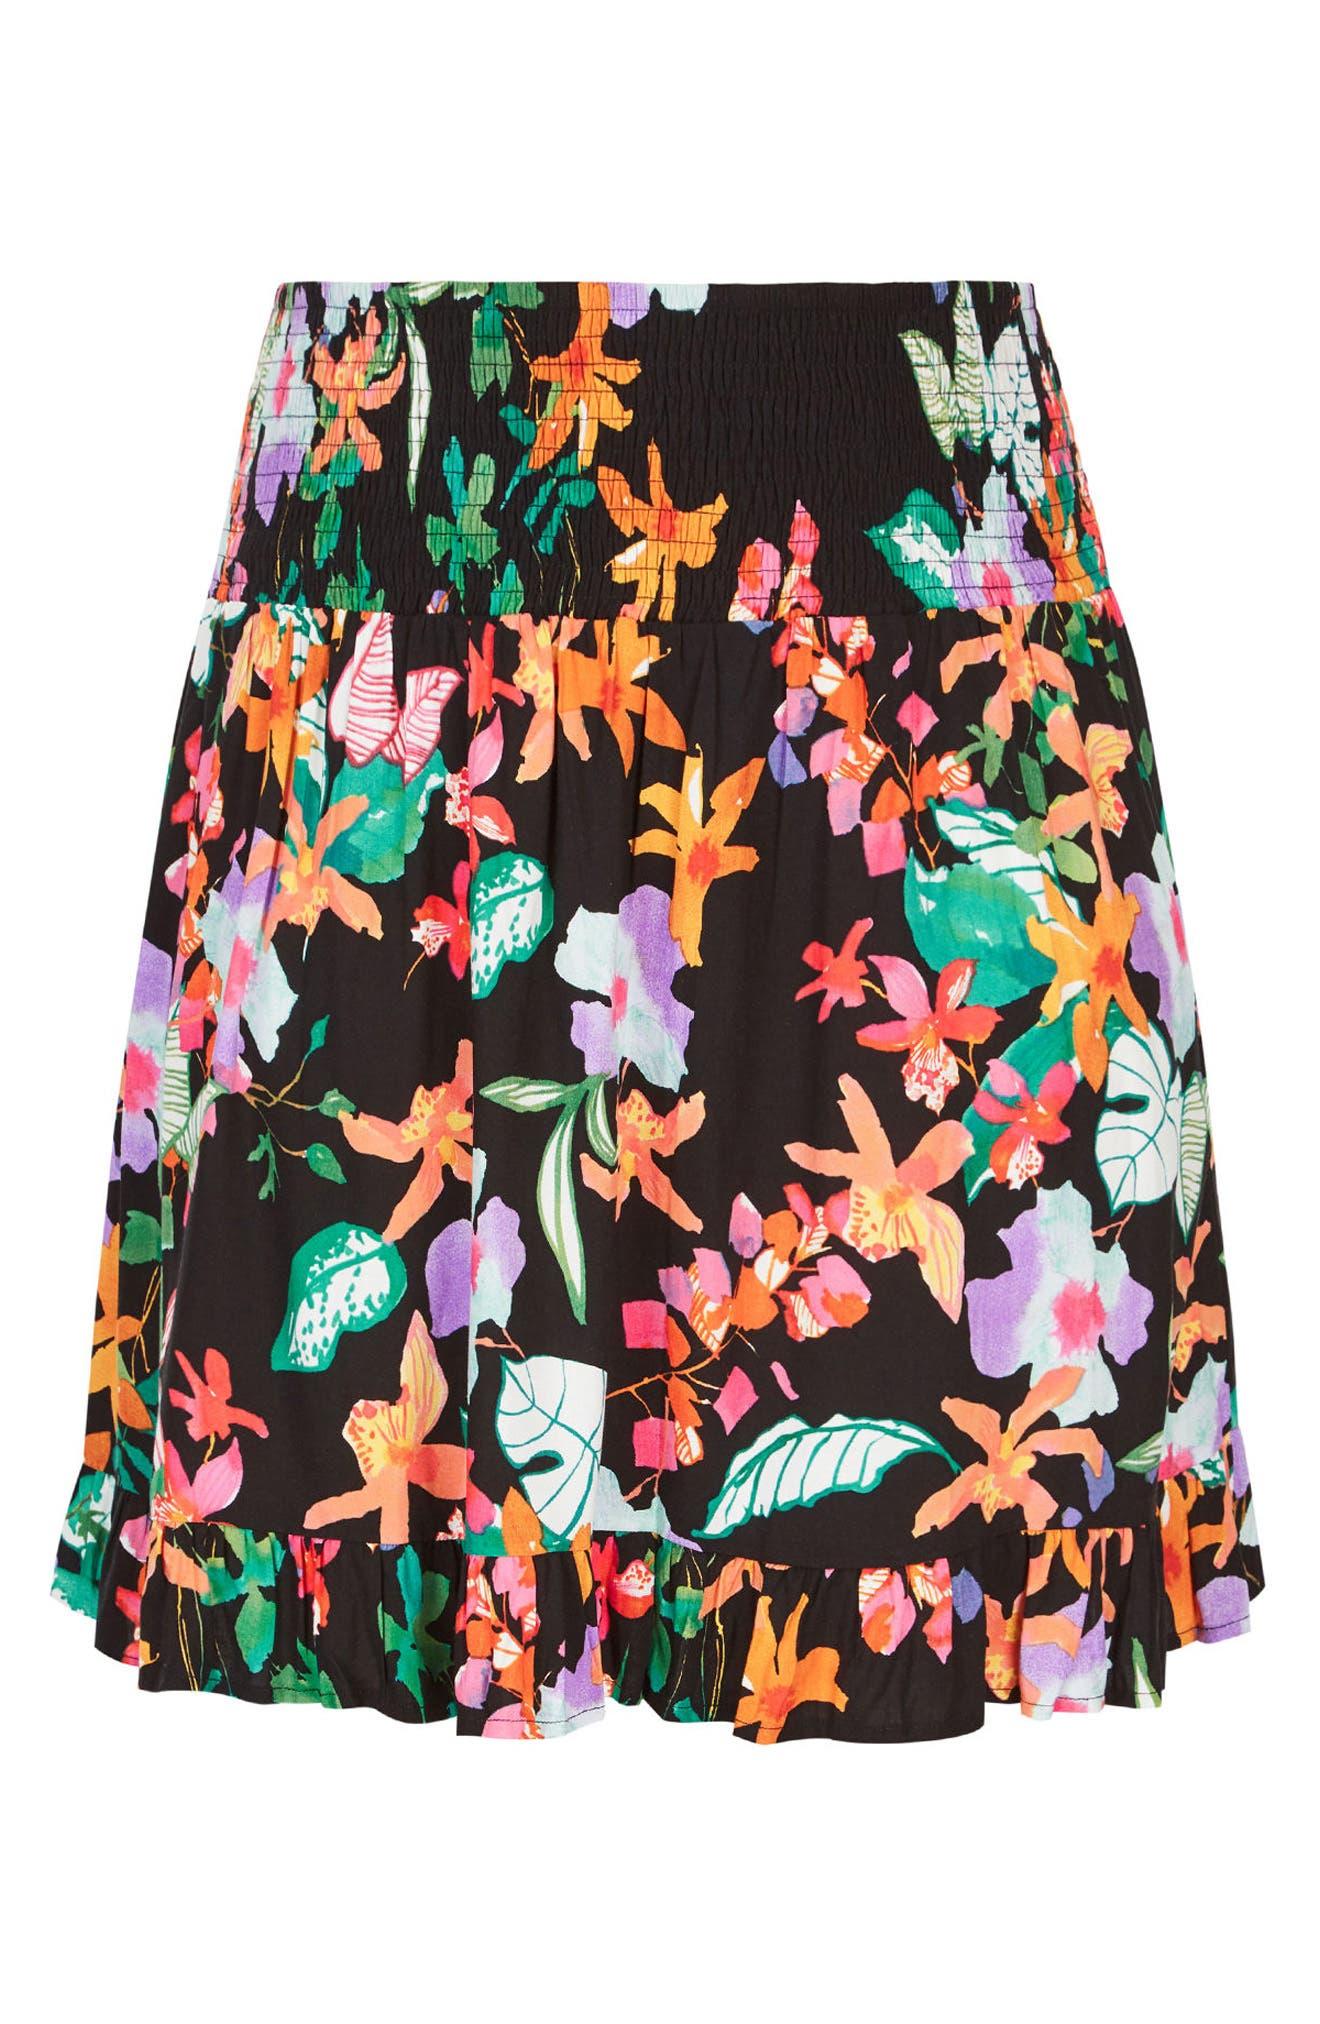 Molokai Floral Skirt,                             Alternate thumbnail 3, color,                             Molokai Floral